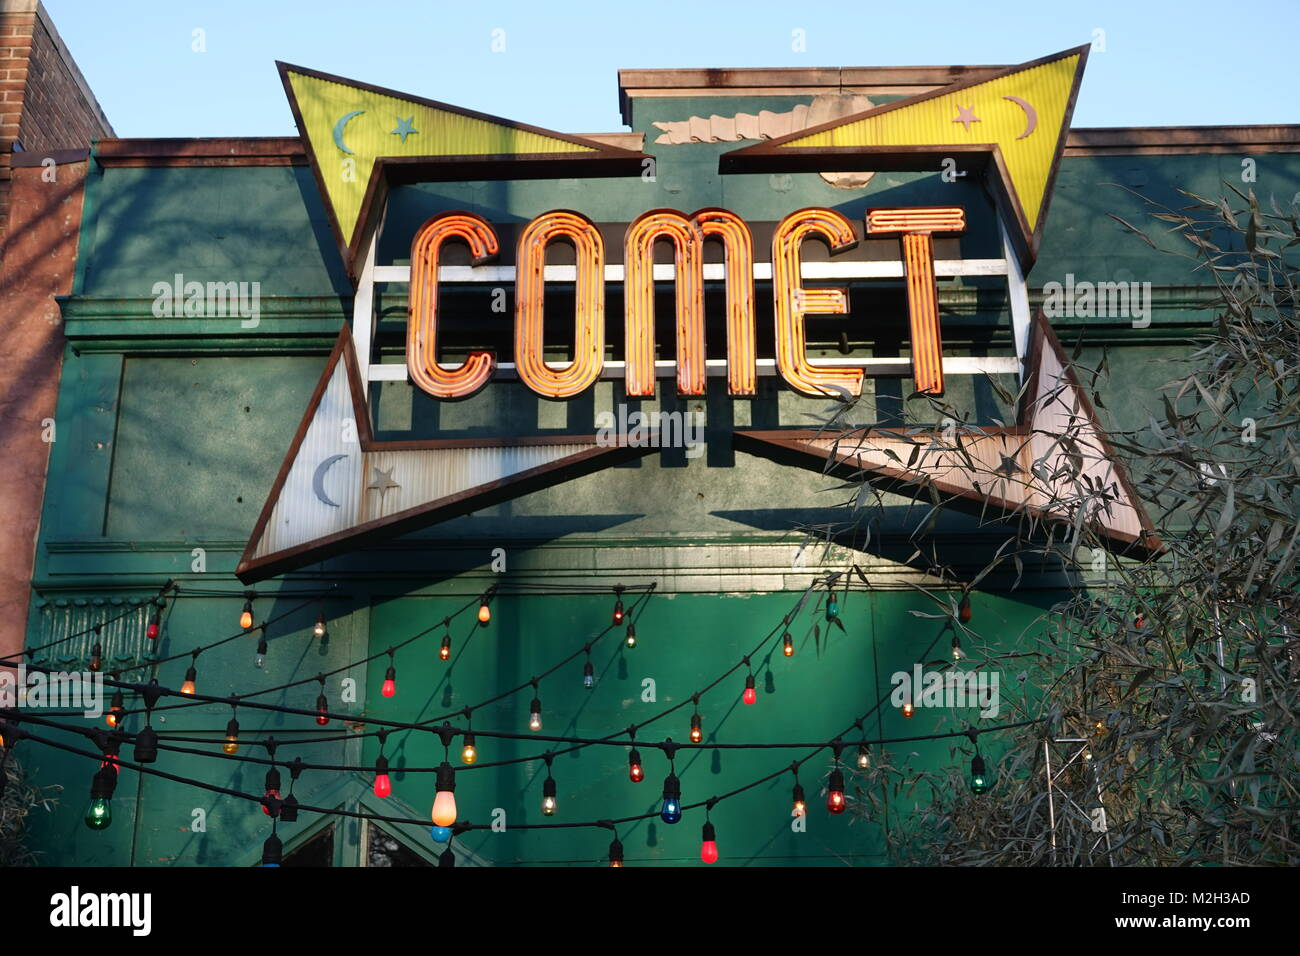 USA Washington DC Comet ping pong pizza controversy Hillary Clinton rumors conspiracy theory exterior - Stock Image